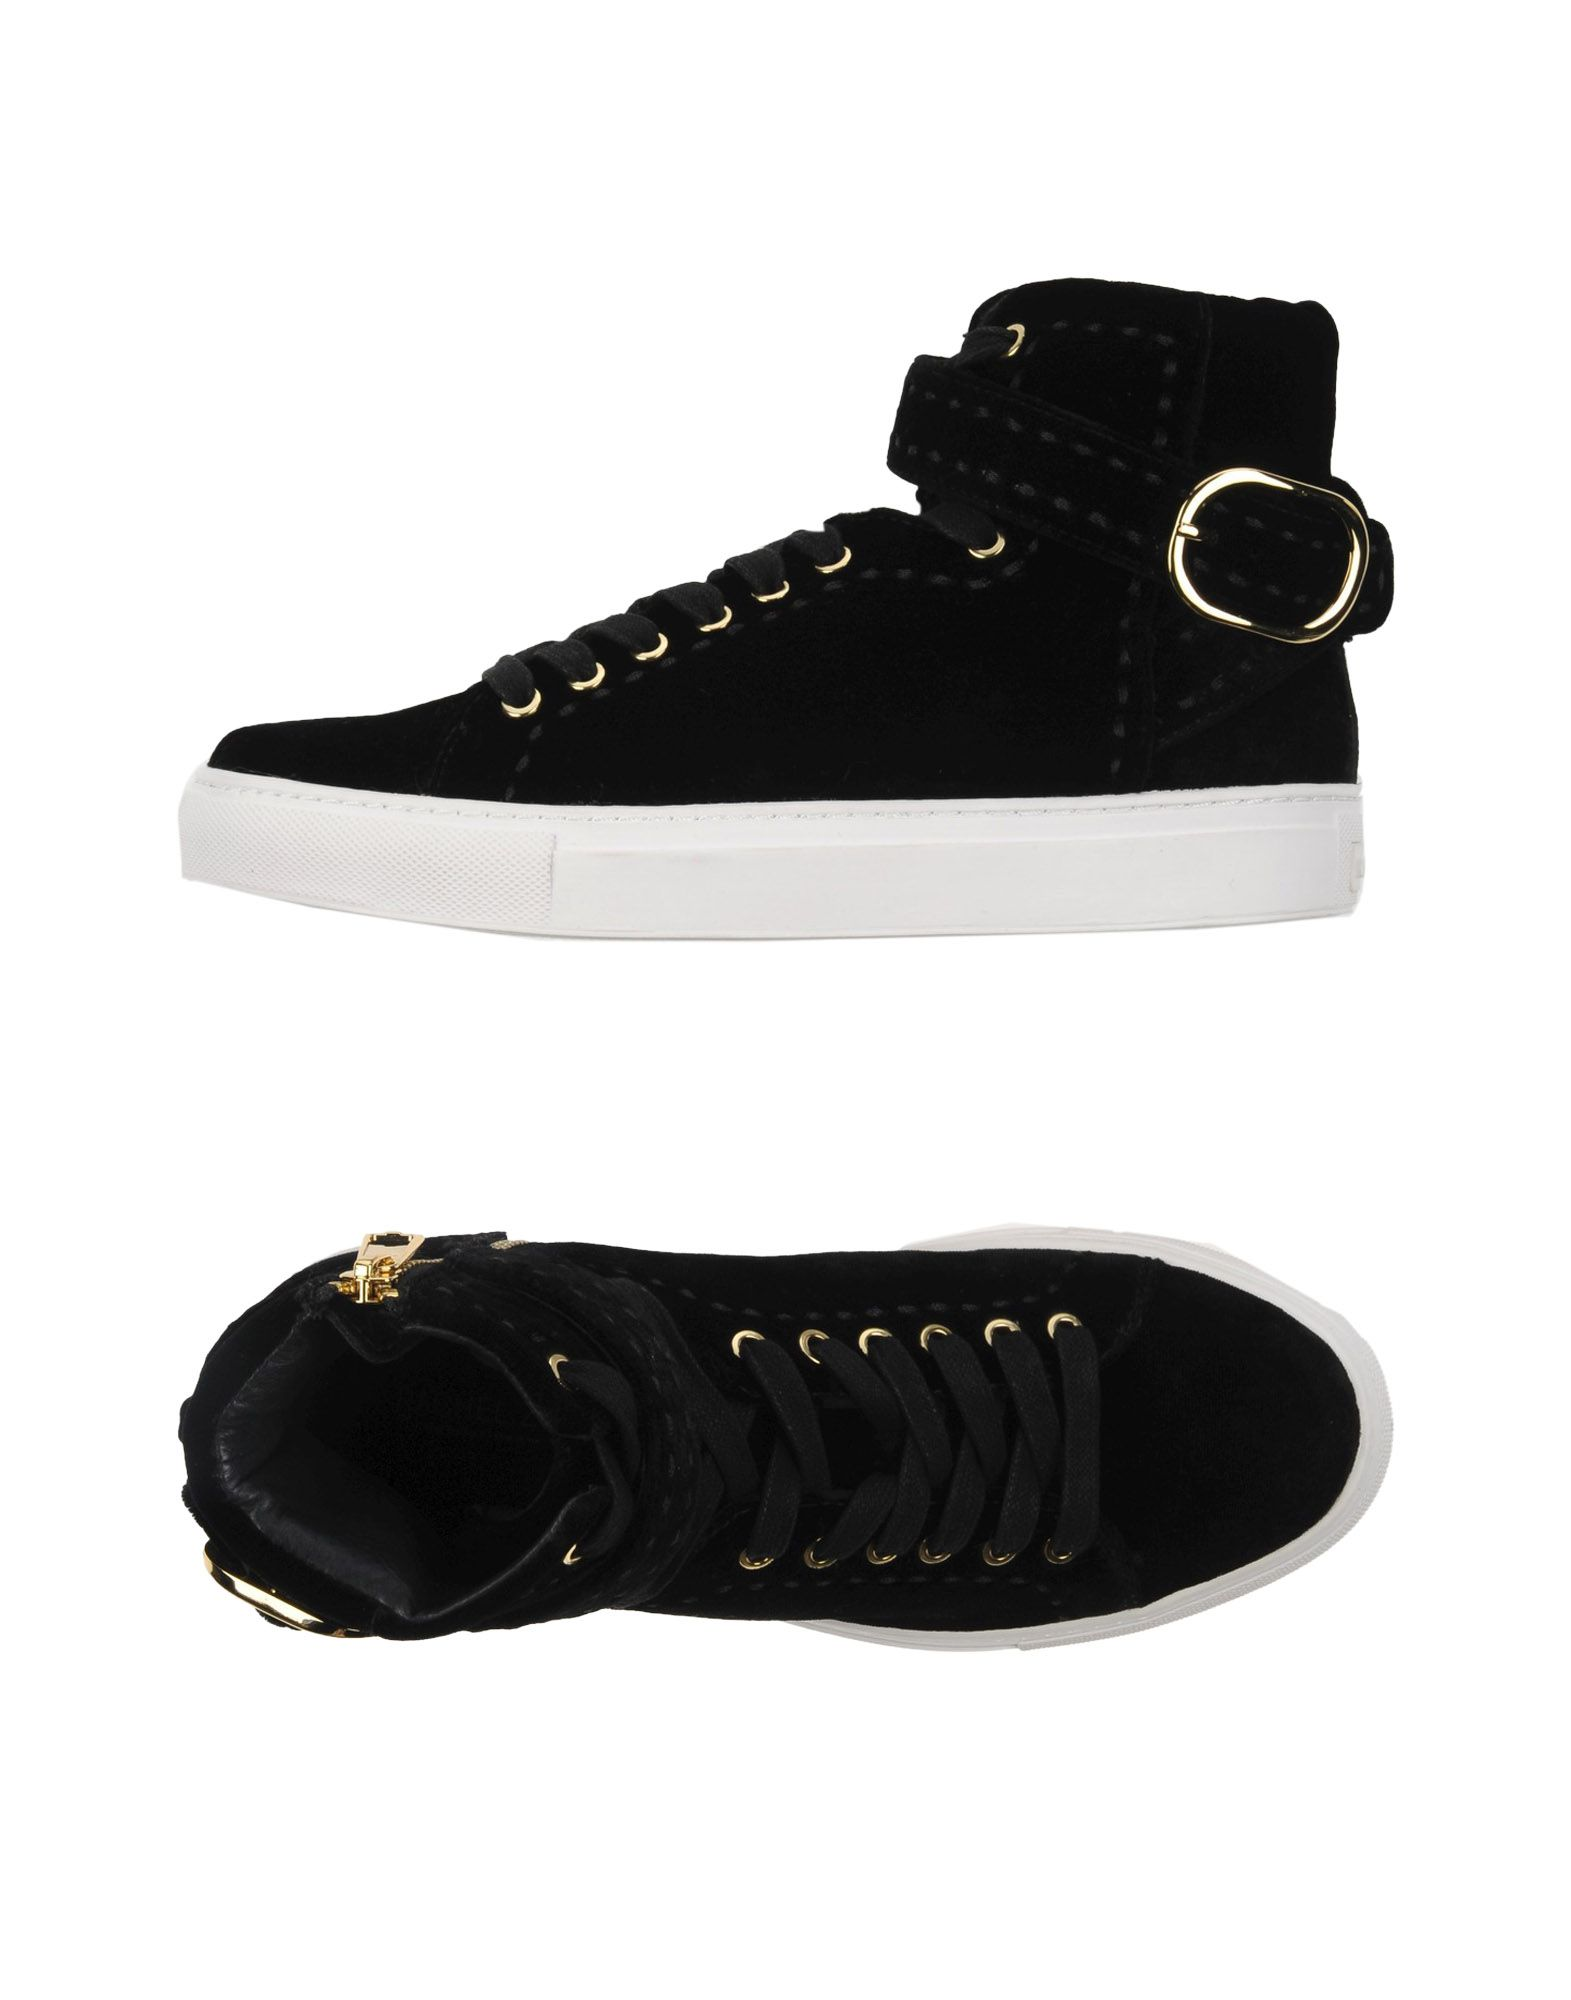 Rachel Zoe Sneakers Damen    11245656QT Gute Qualität beliebte Schuhe 278edf